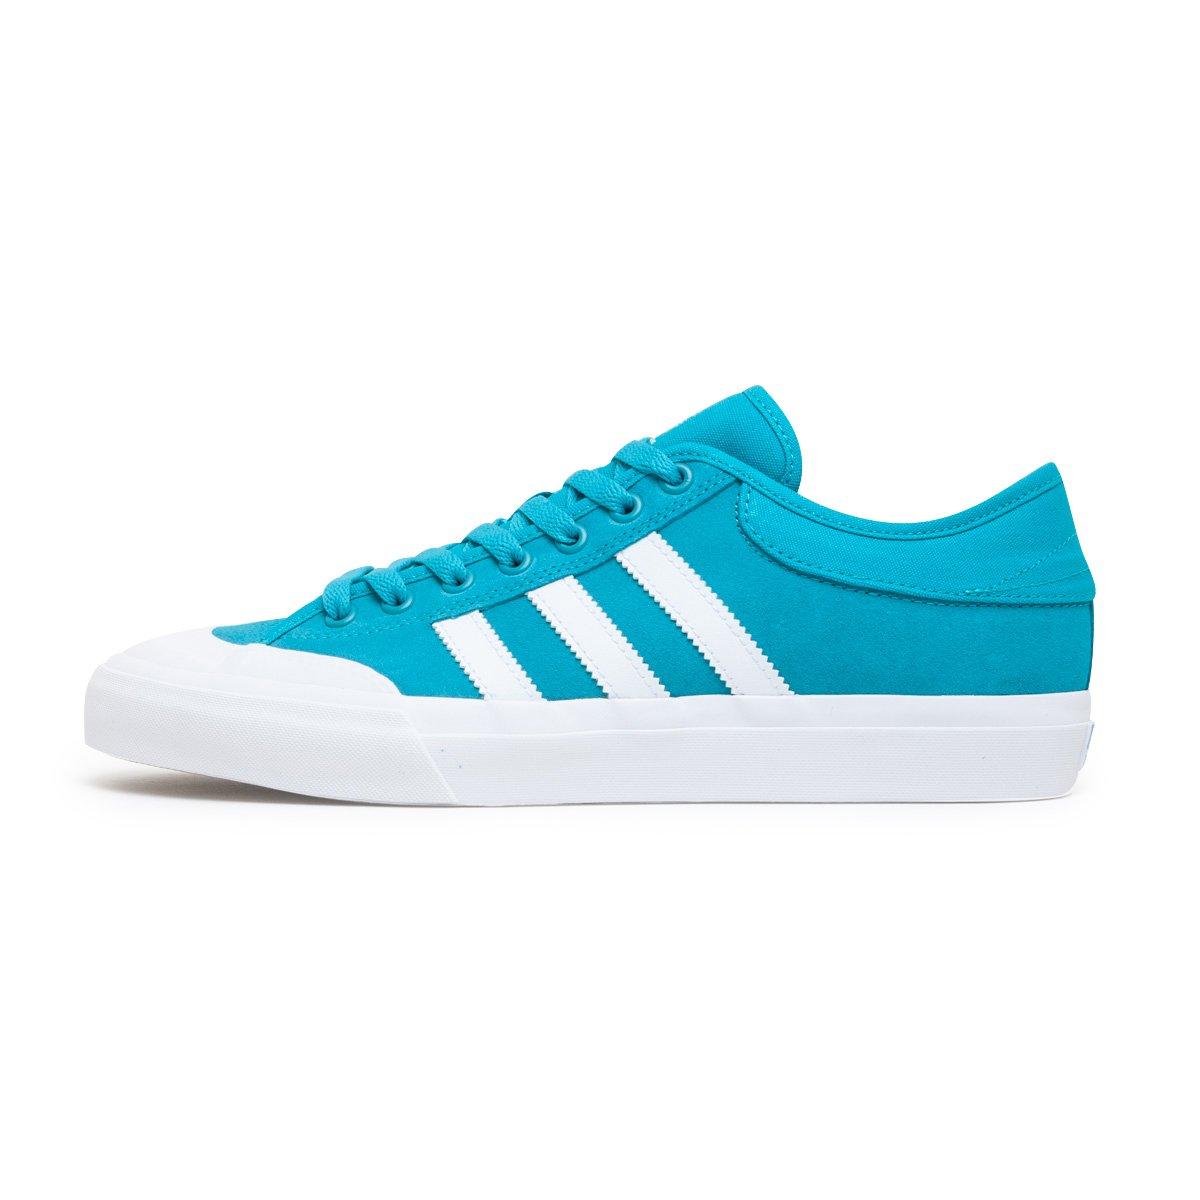 Adidas Herren matchcourt matchcourt matchcourt ADV Skate Schuhe 8881e2